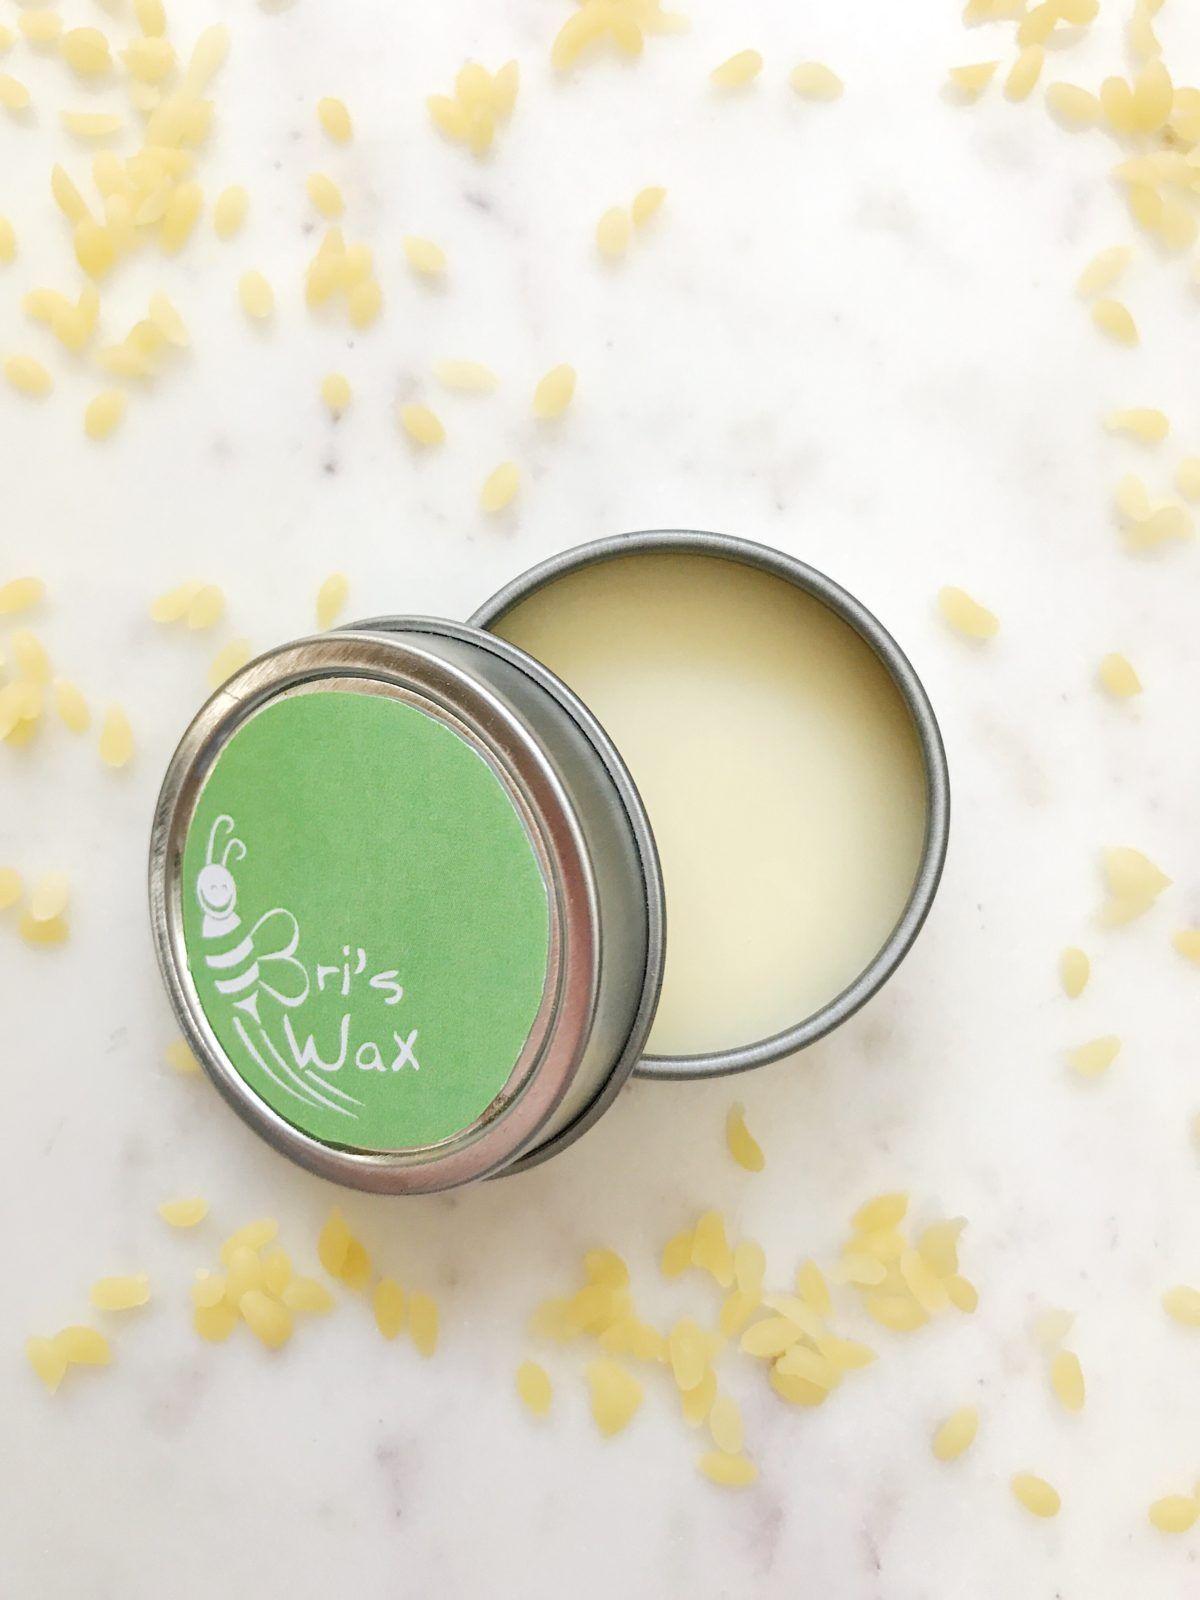 Diy homemade natural lip balm made with beeswax and